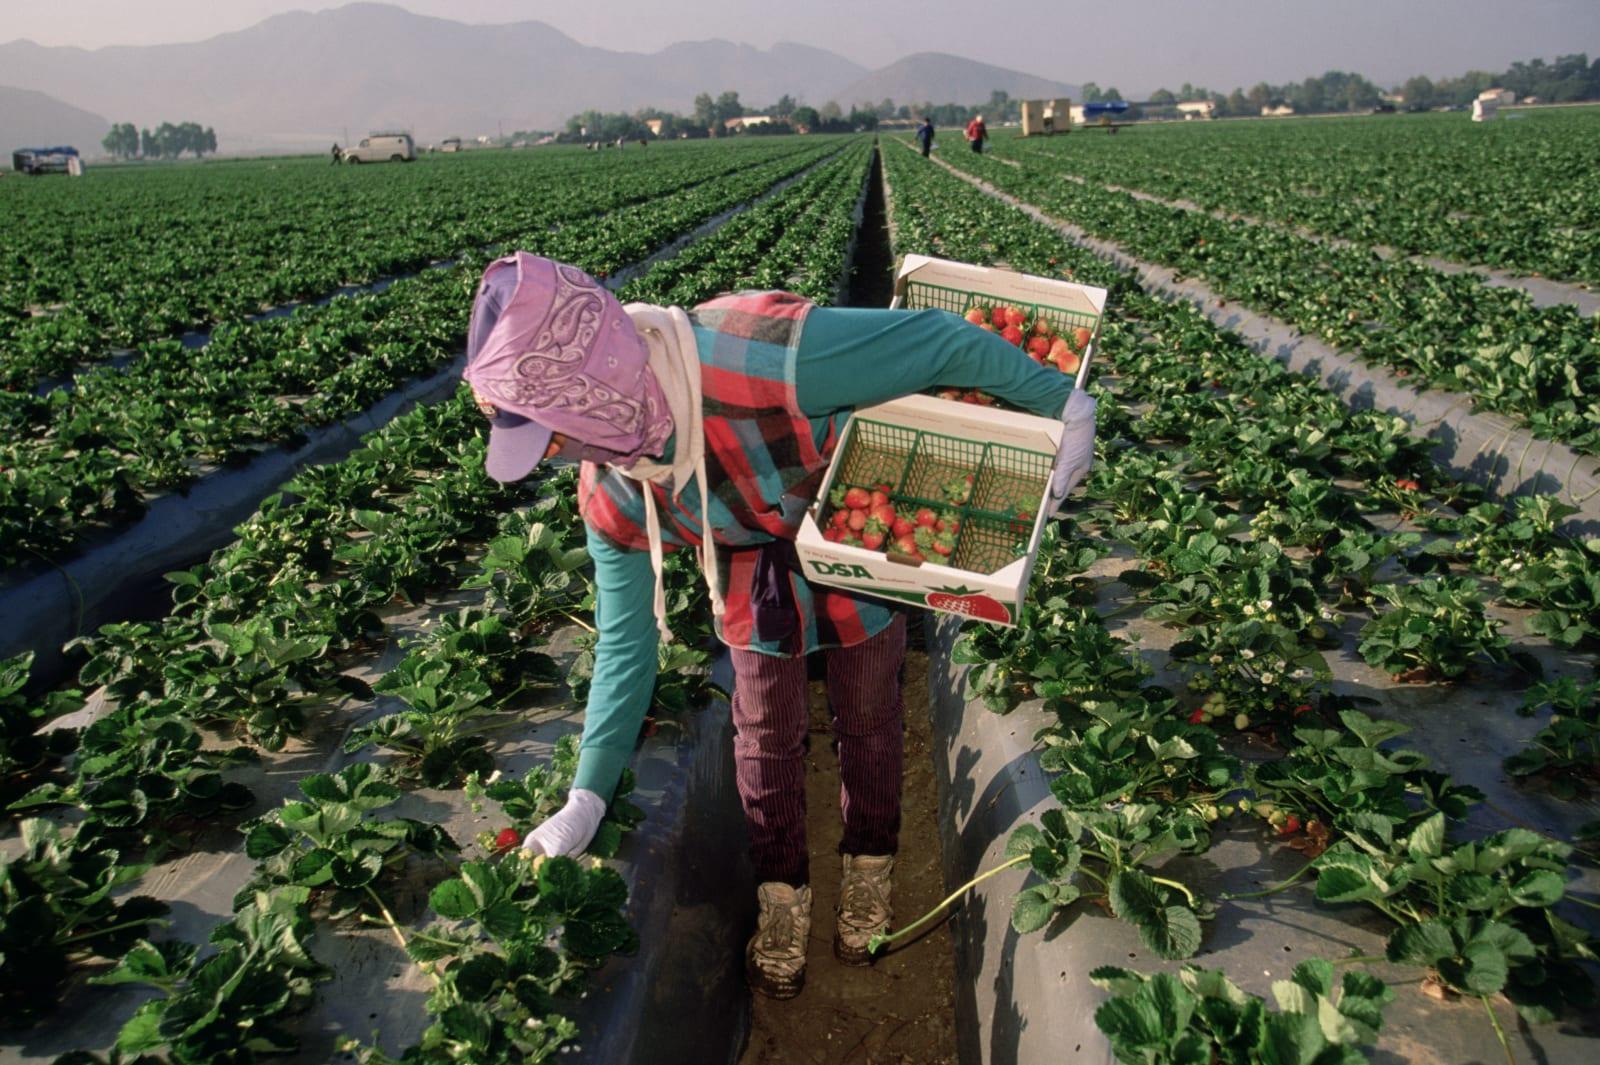 Migrant Worker Harvesting California Strawberries